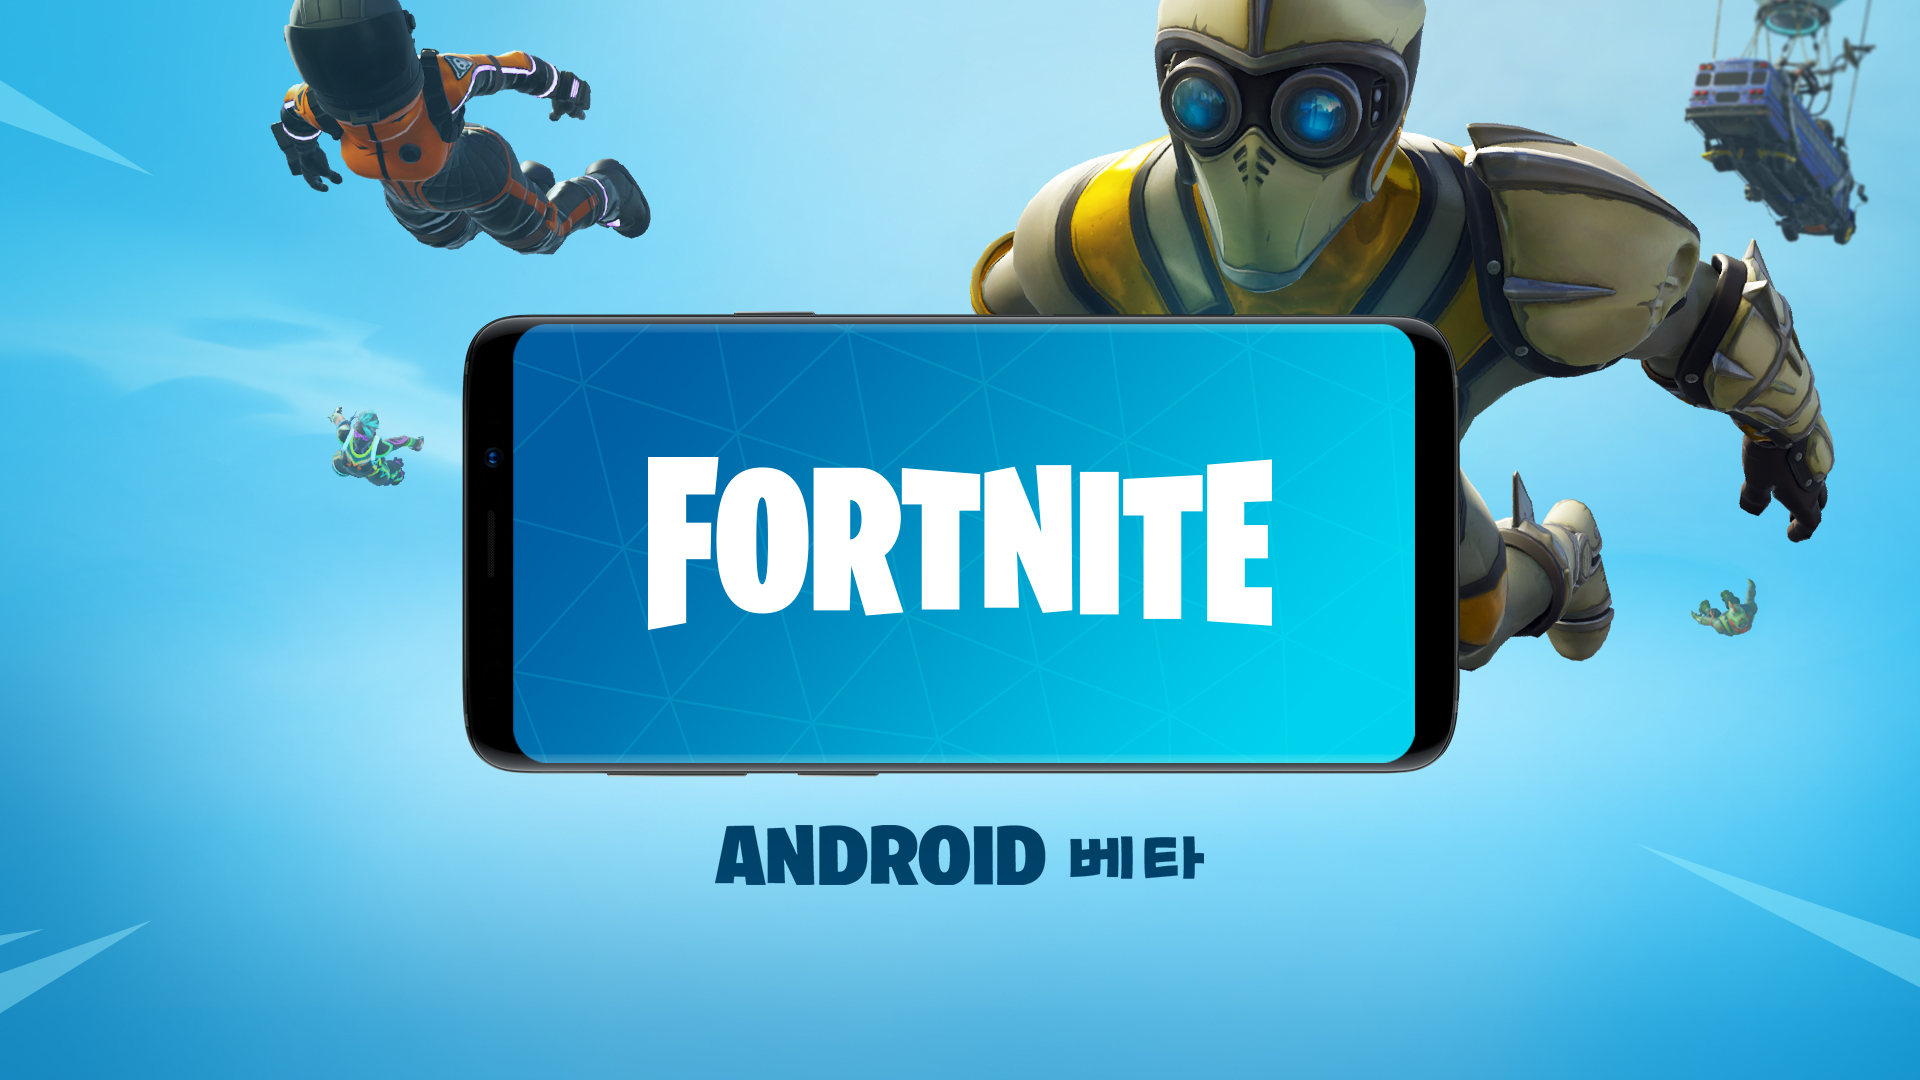 KO_Android-Beta_YouTube-Thumb.jpg